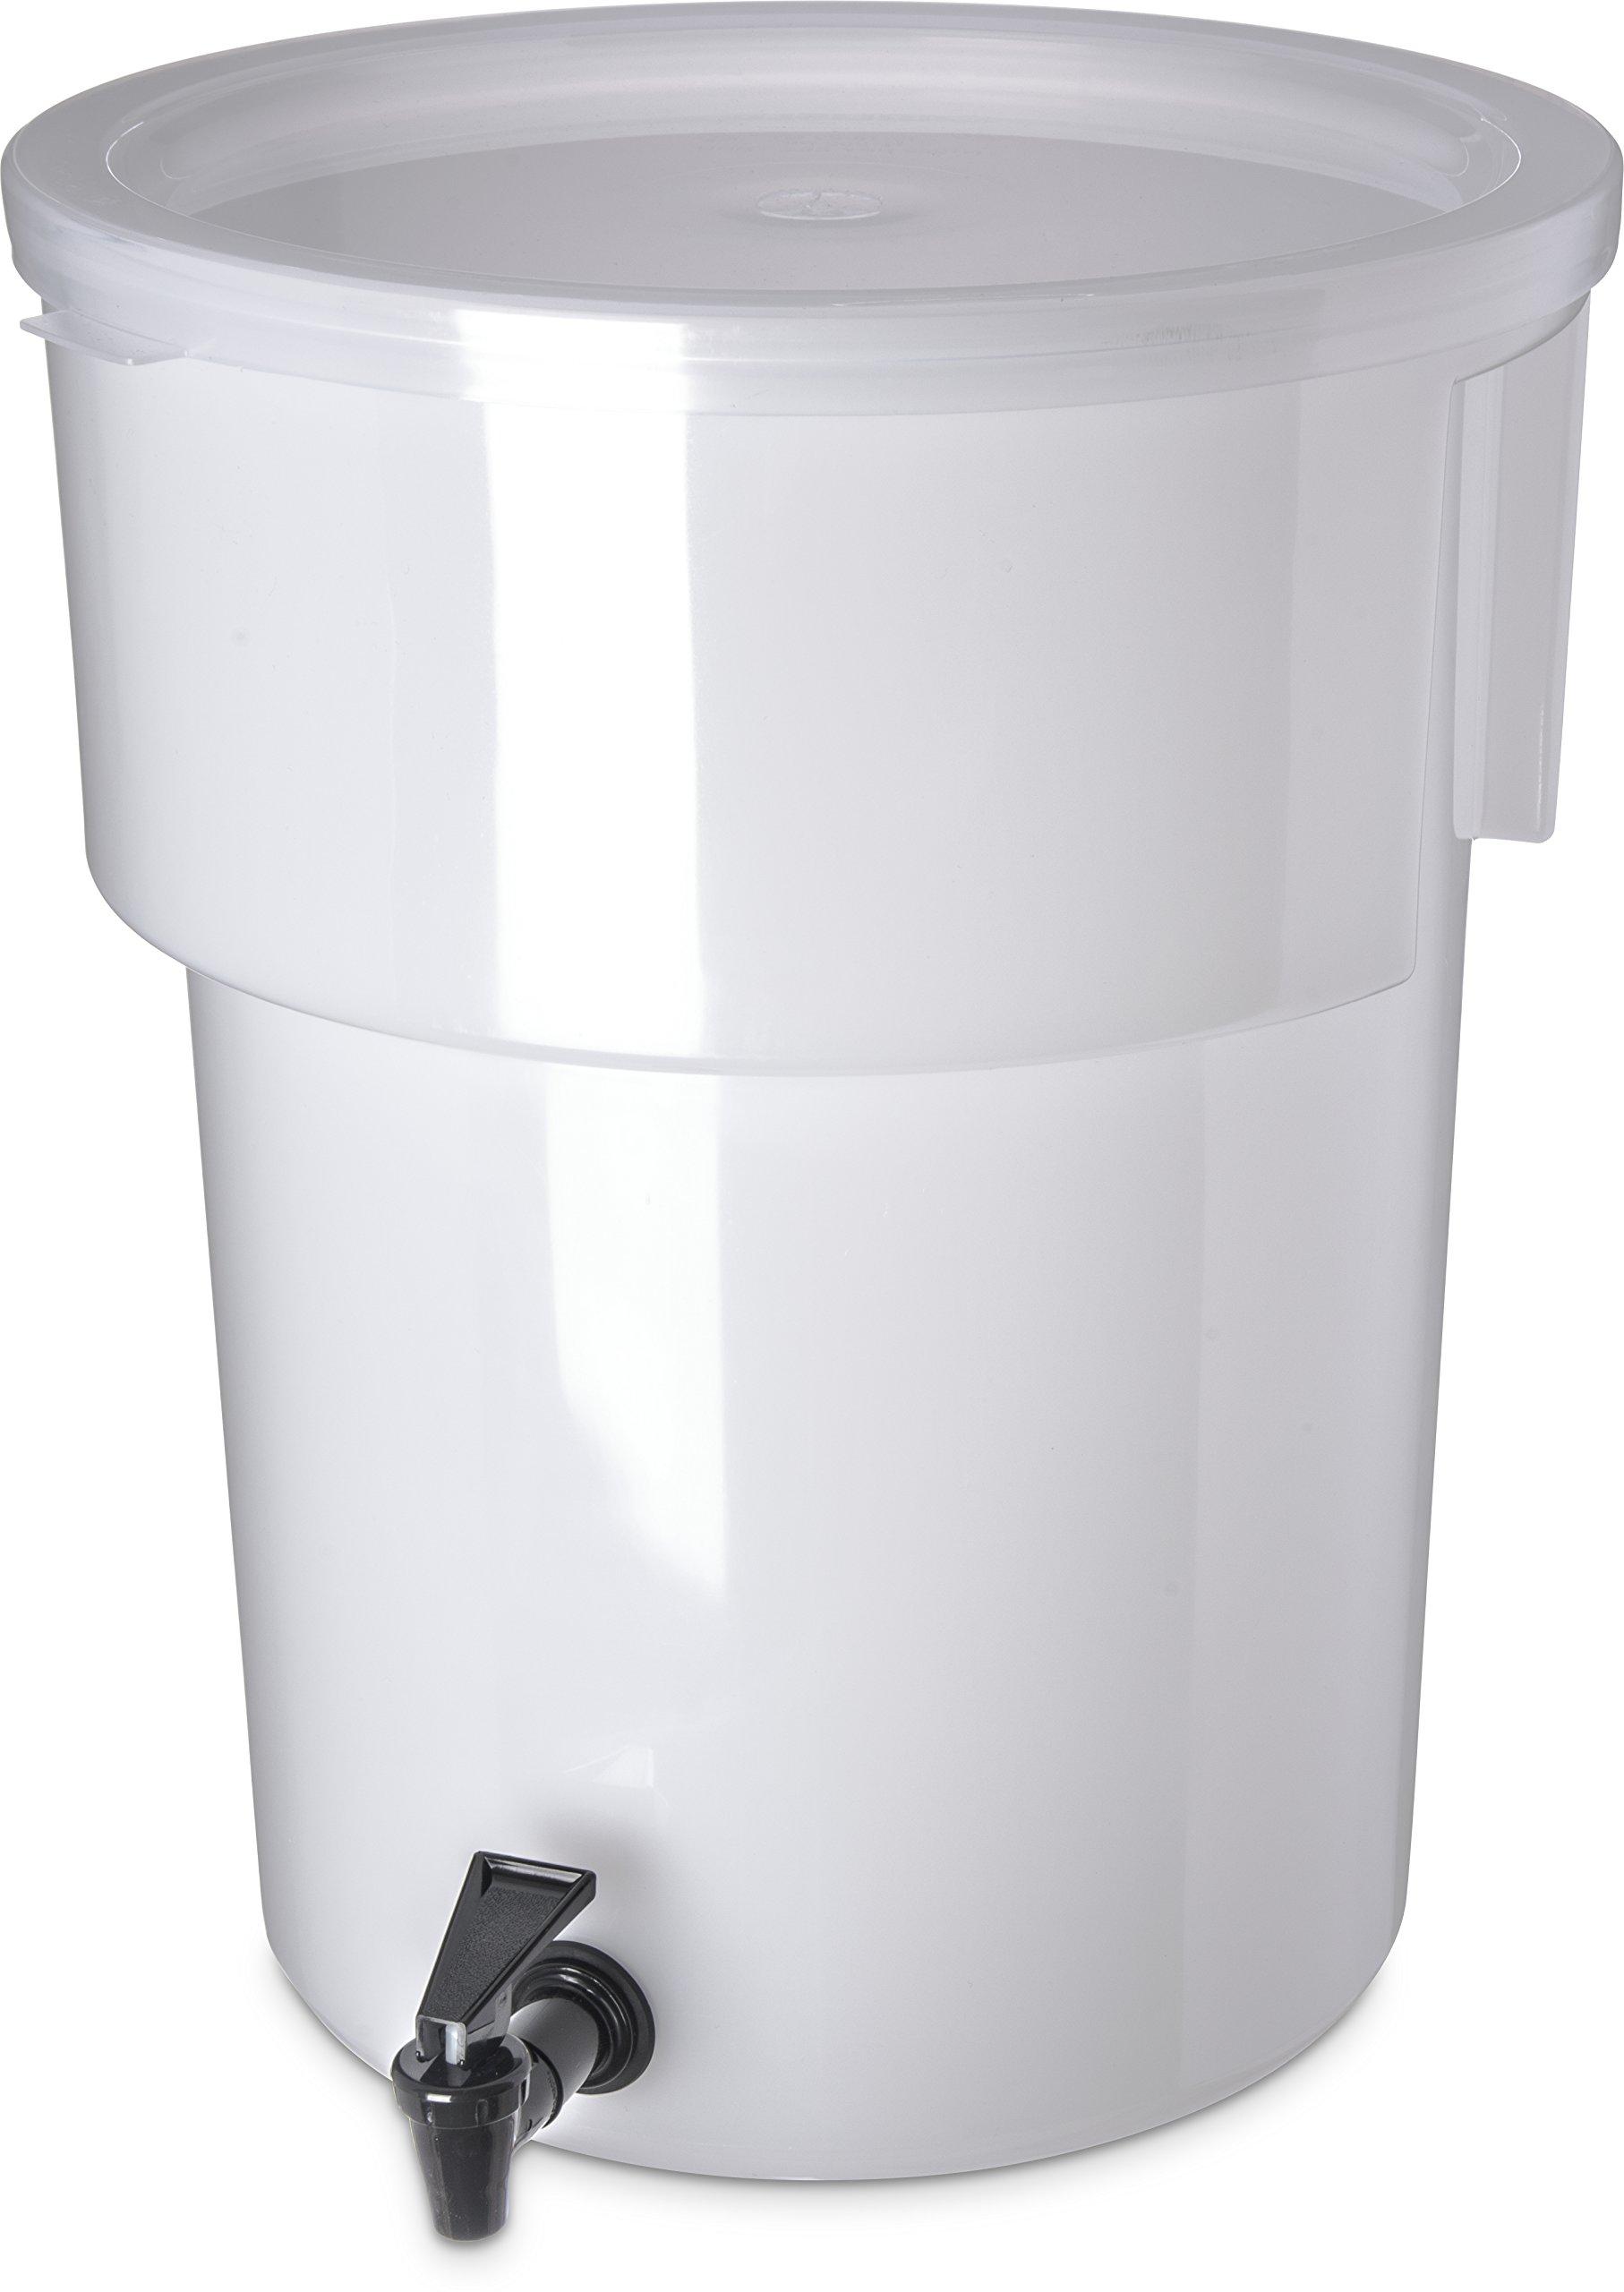 Carlisle 221002 Polyethylene Round Beverage Dispenser, 5 gal. Capacity, 12-3/8'' Dia. x 15-7/16'' H, White